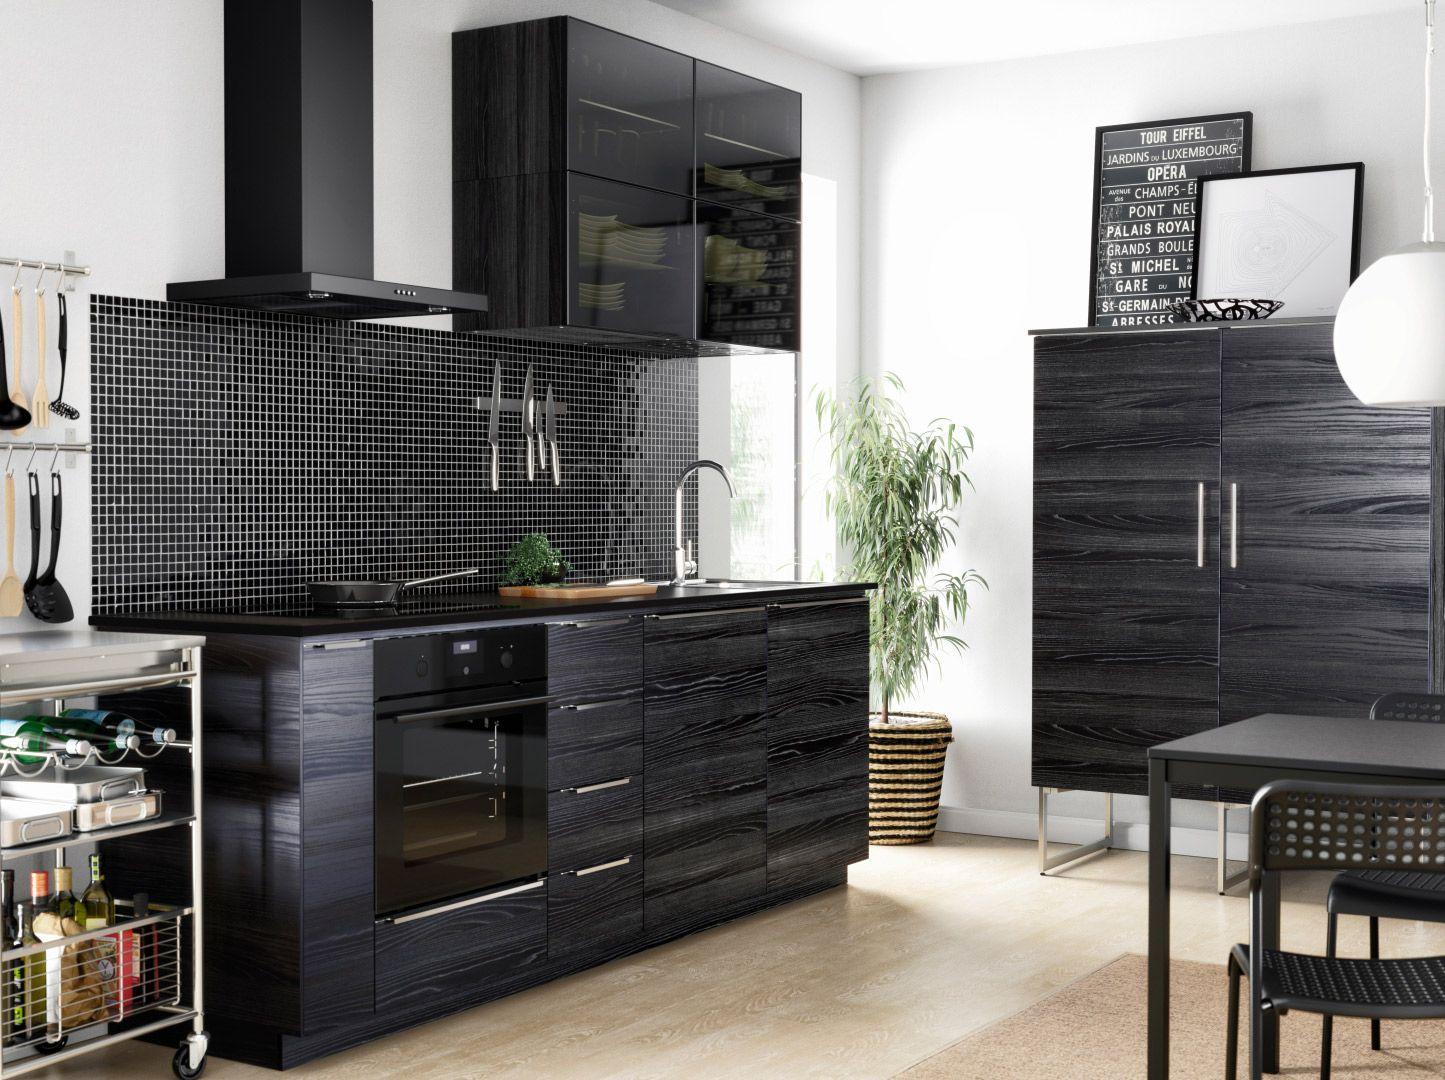 small kitchen remodel ideas | kitchen Interior Design Pictures Ideas ...